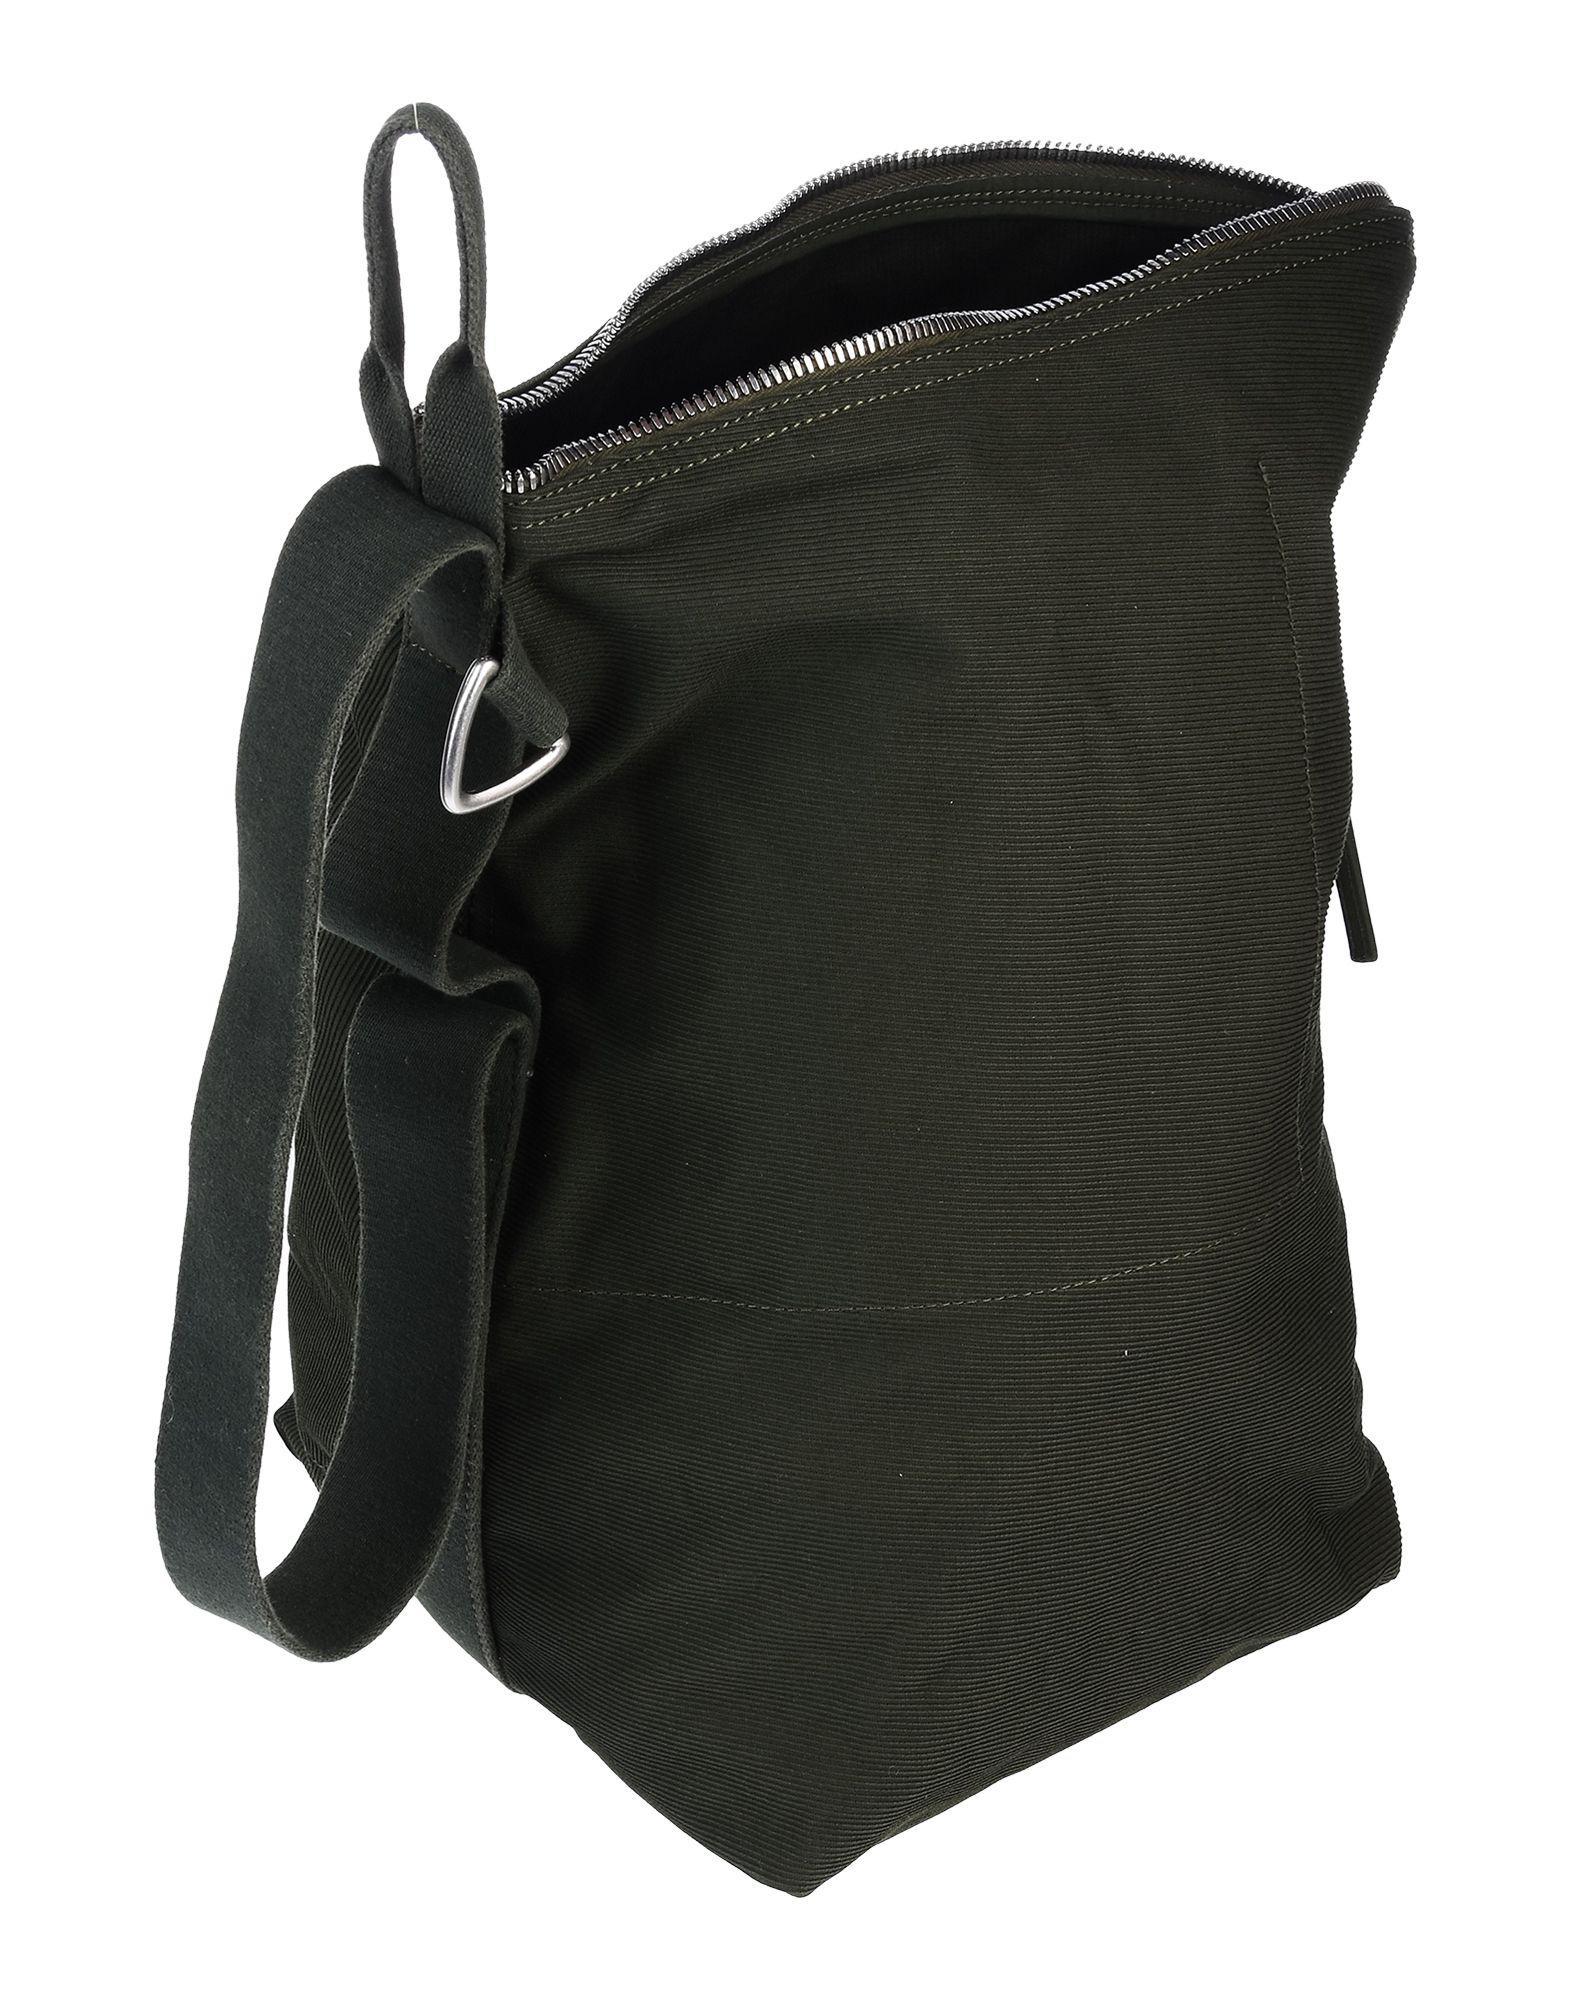 Lyst - DRKSHDW by Rick Owens Backpacks   Bum Bags in Green for Men 4c479090eb25b